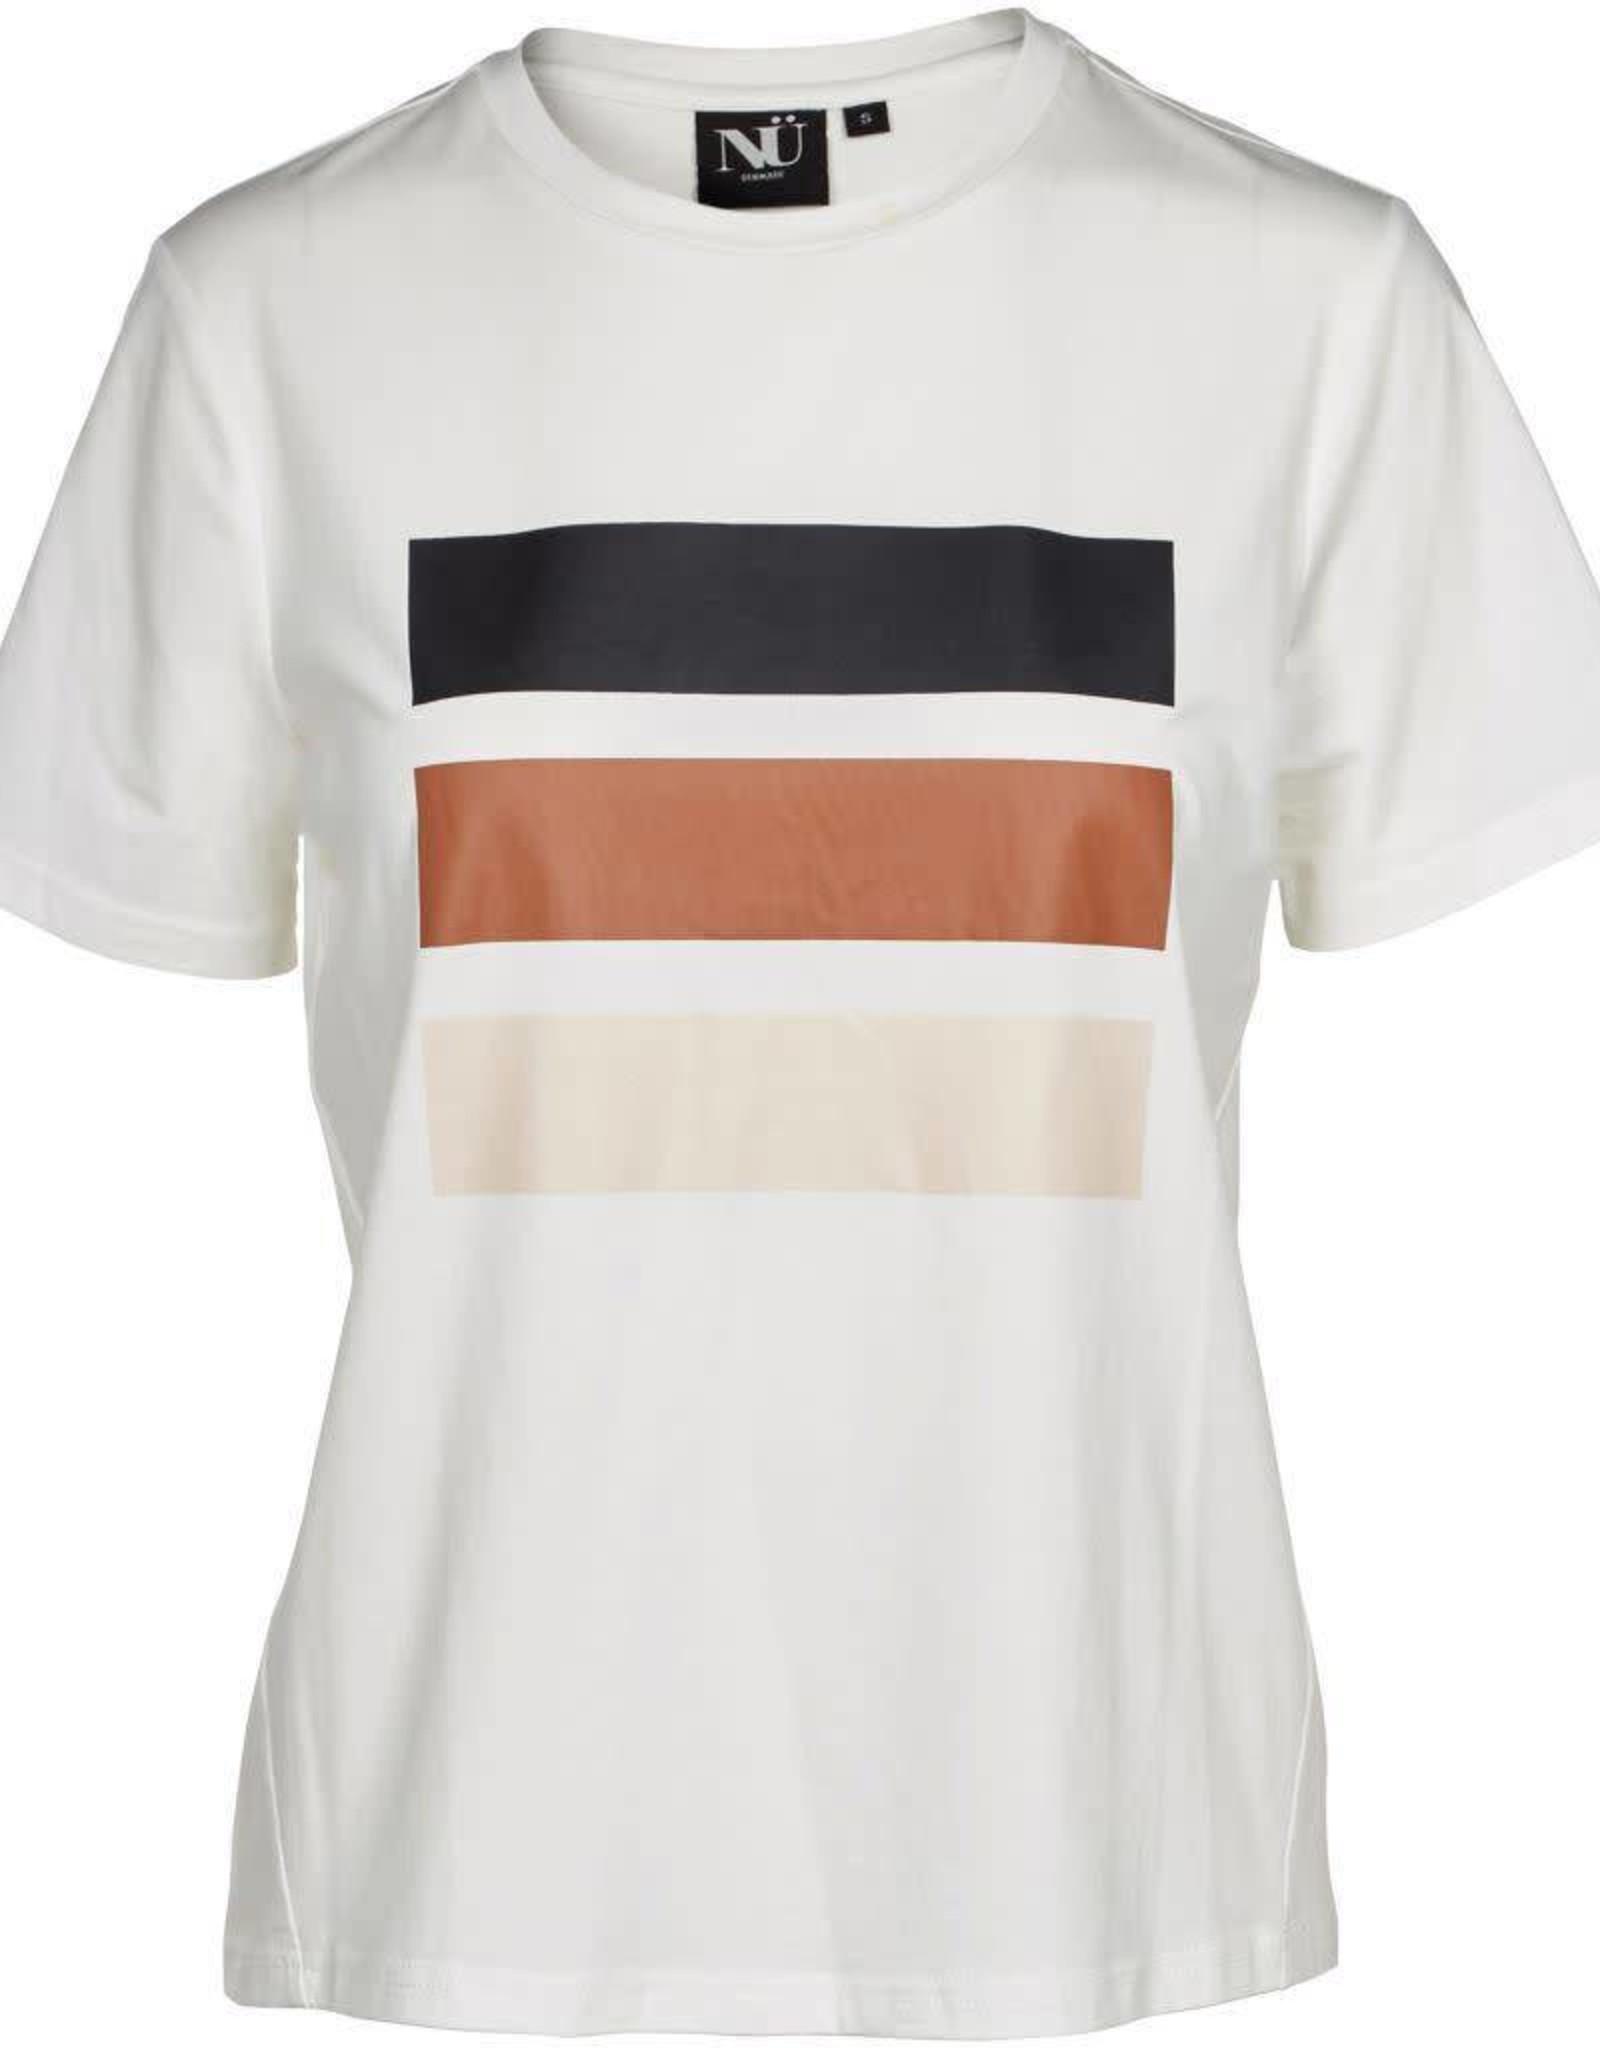 NÜ Denmark T-Shirt With Stripe Print